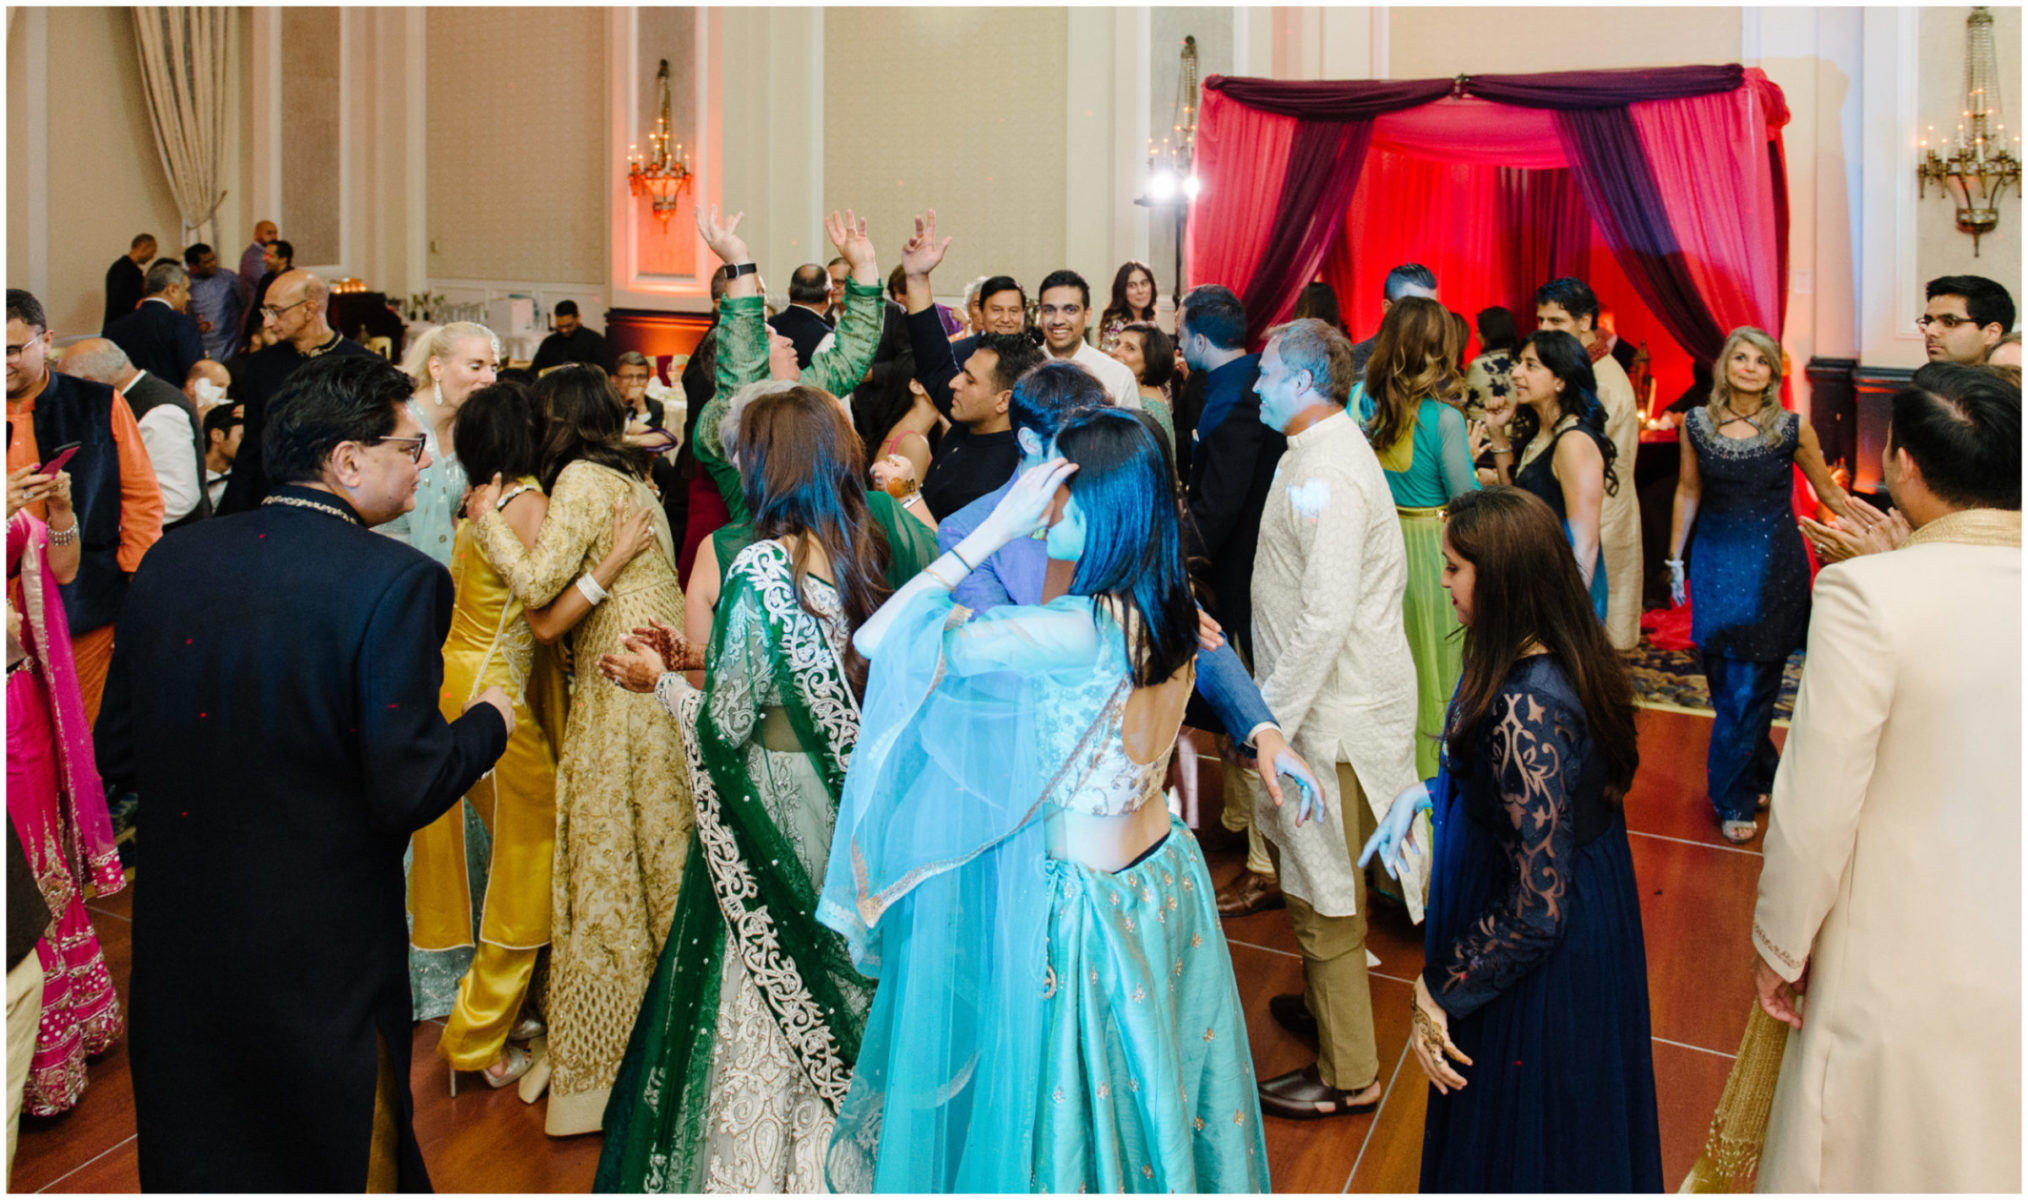 east indian Wedding Planner edmonton fairmont